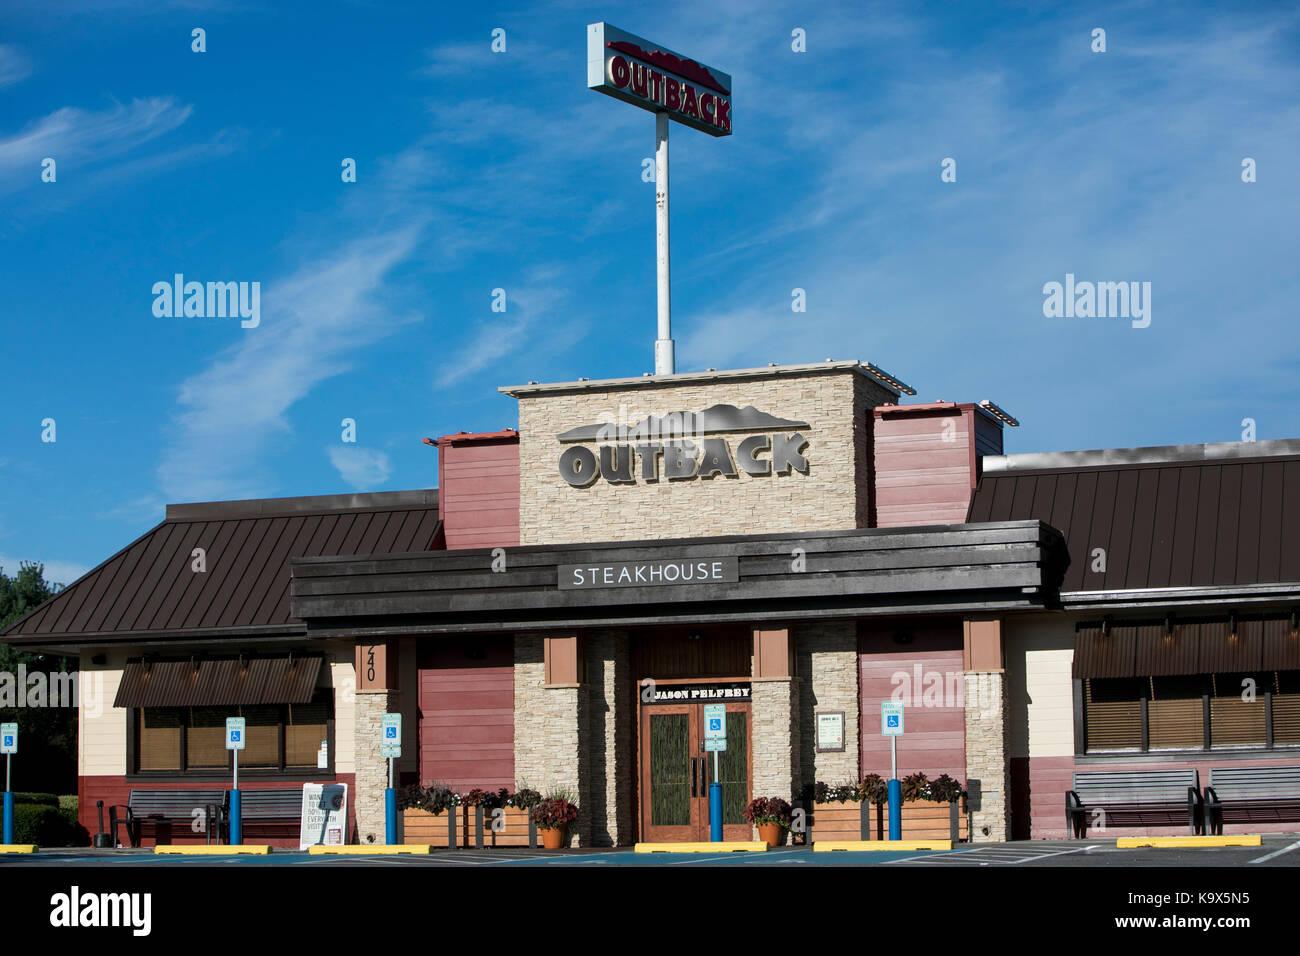 Outback Restaurant San Francisco